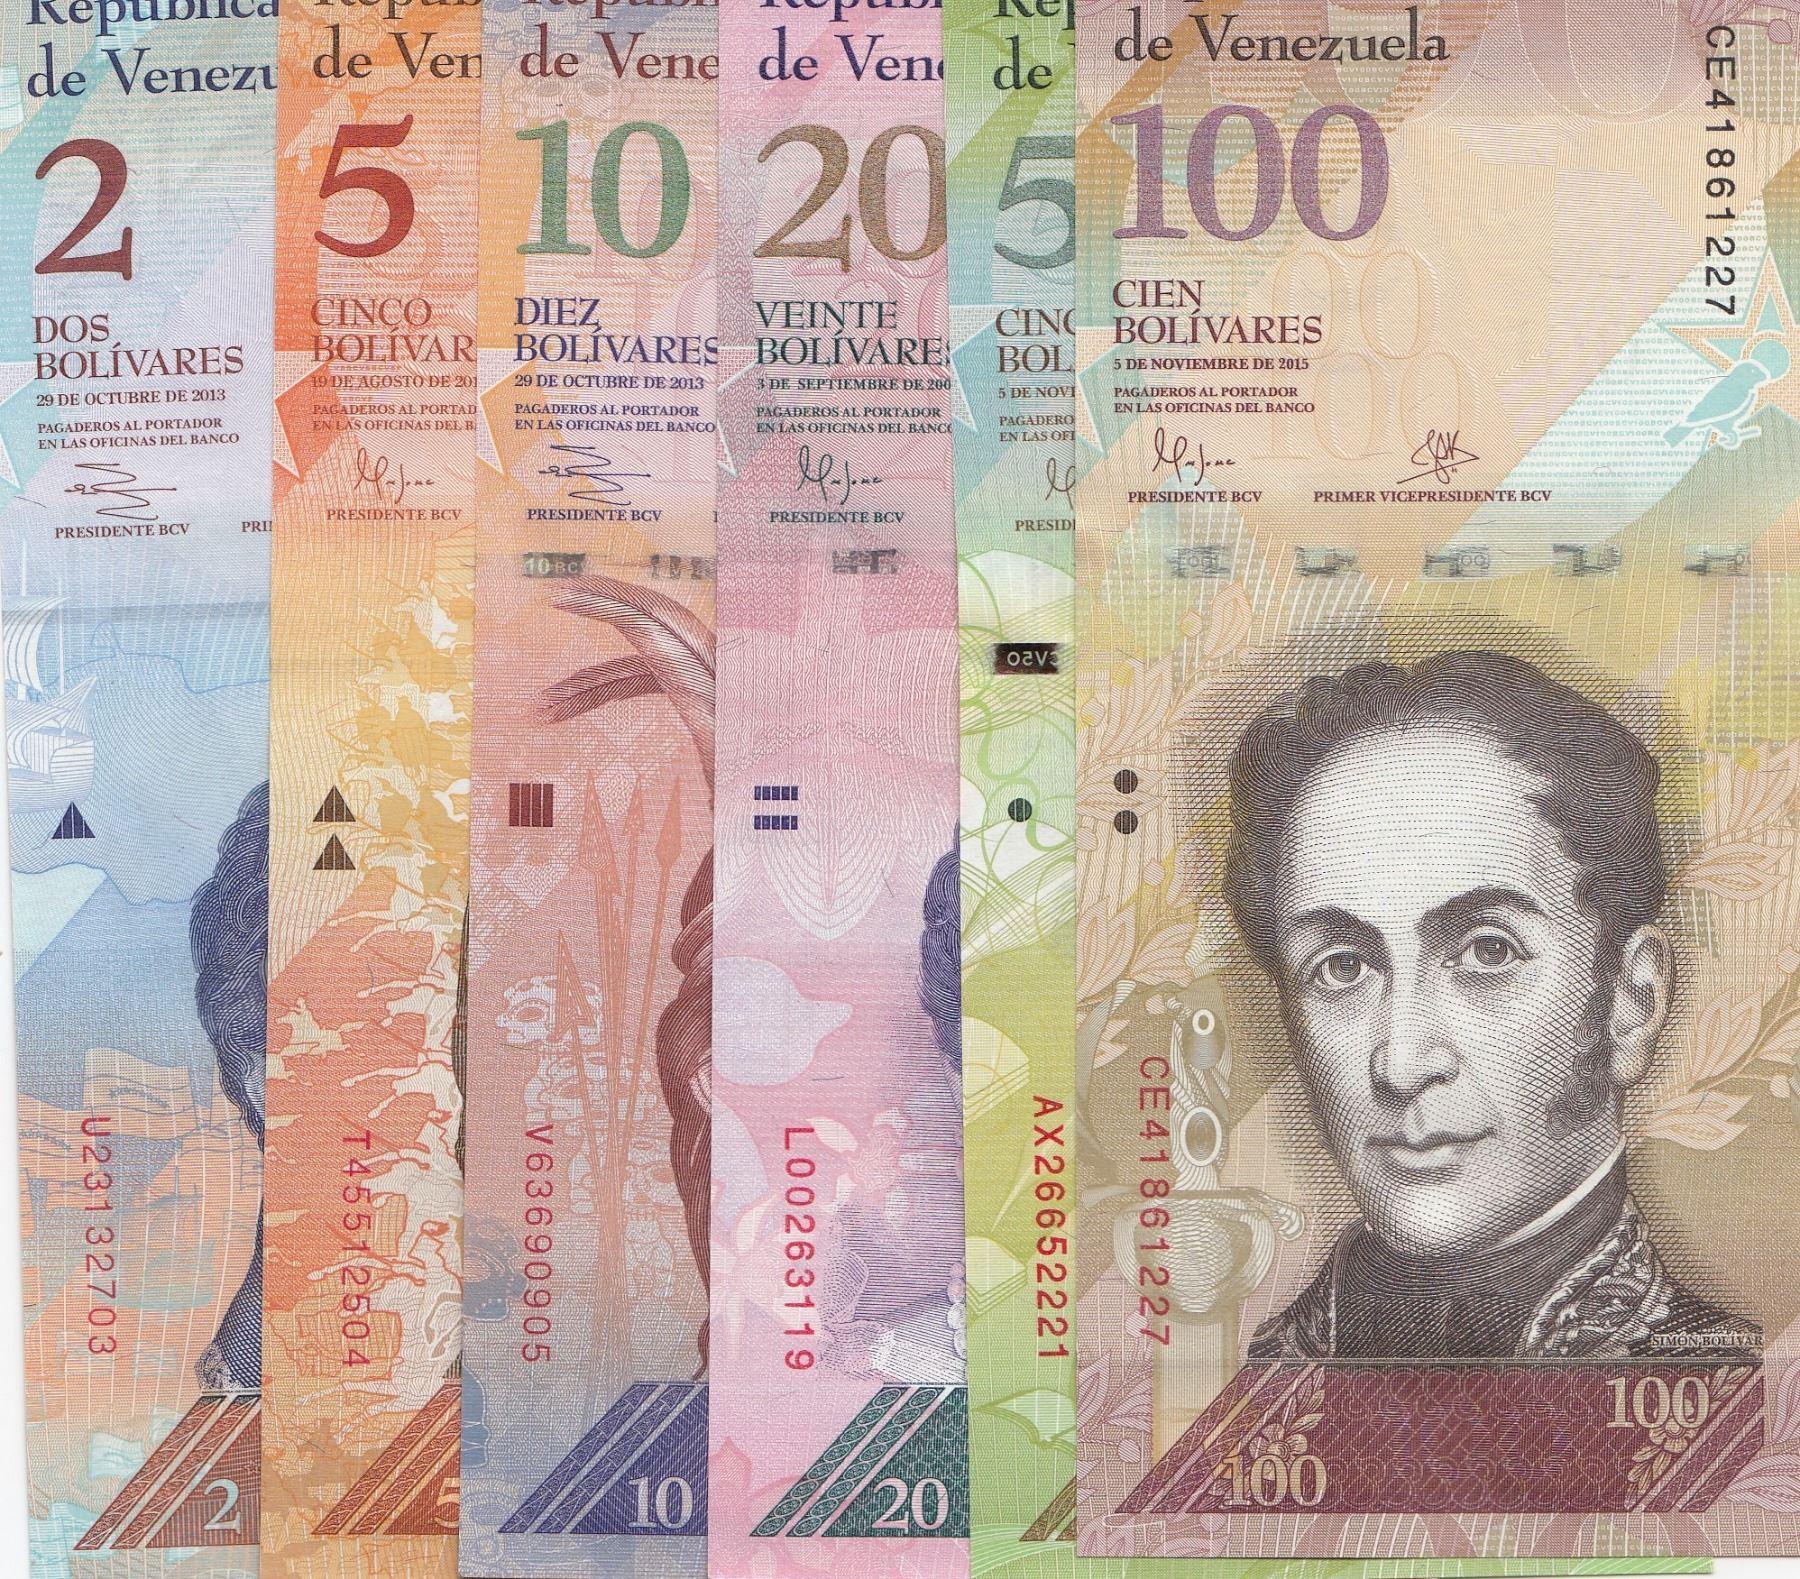 Lot of 5 Bank Notes from Venezuela 50 Bolivares